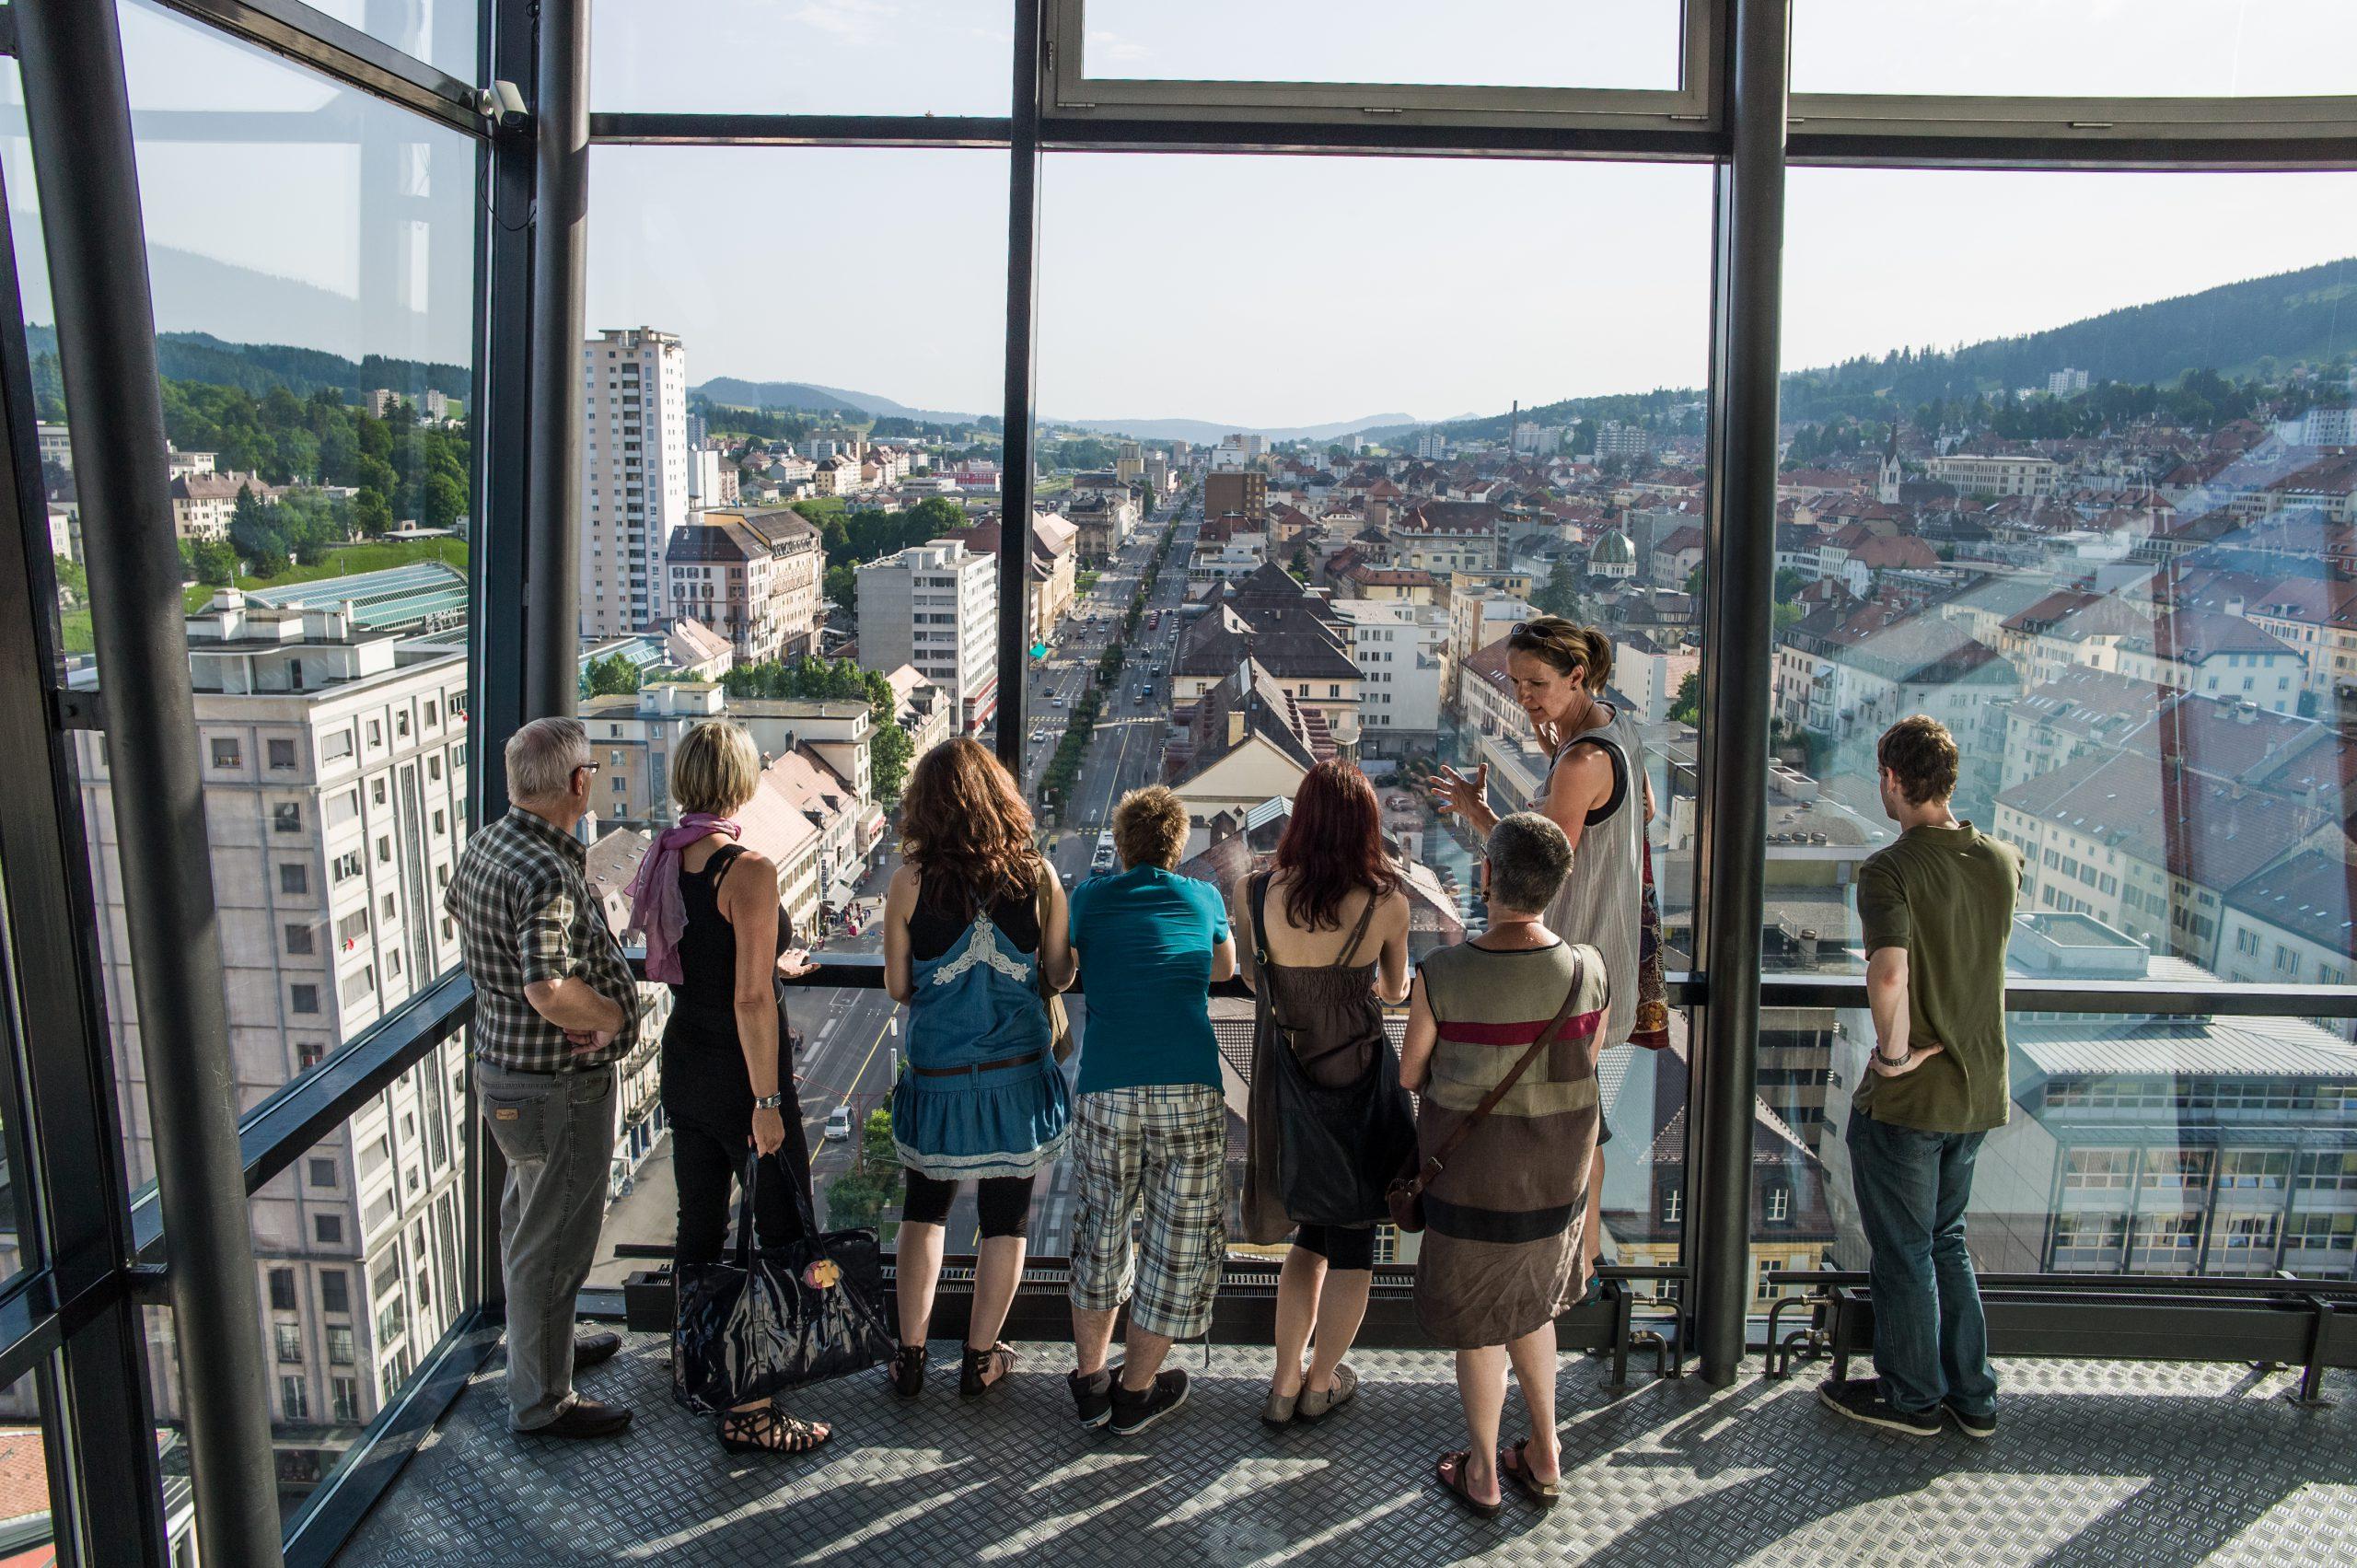 """Watchmaking town planning"" guided walking tour"